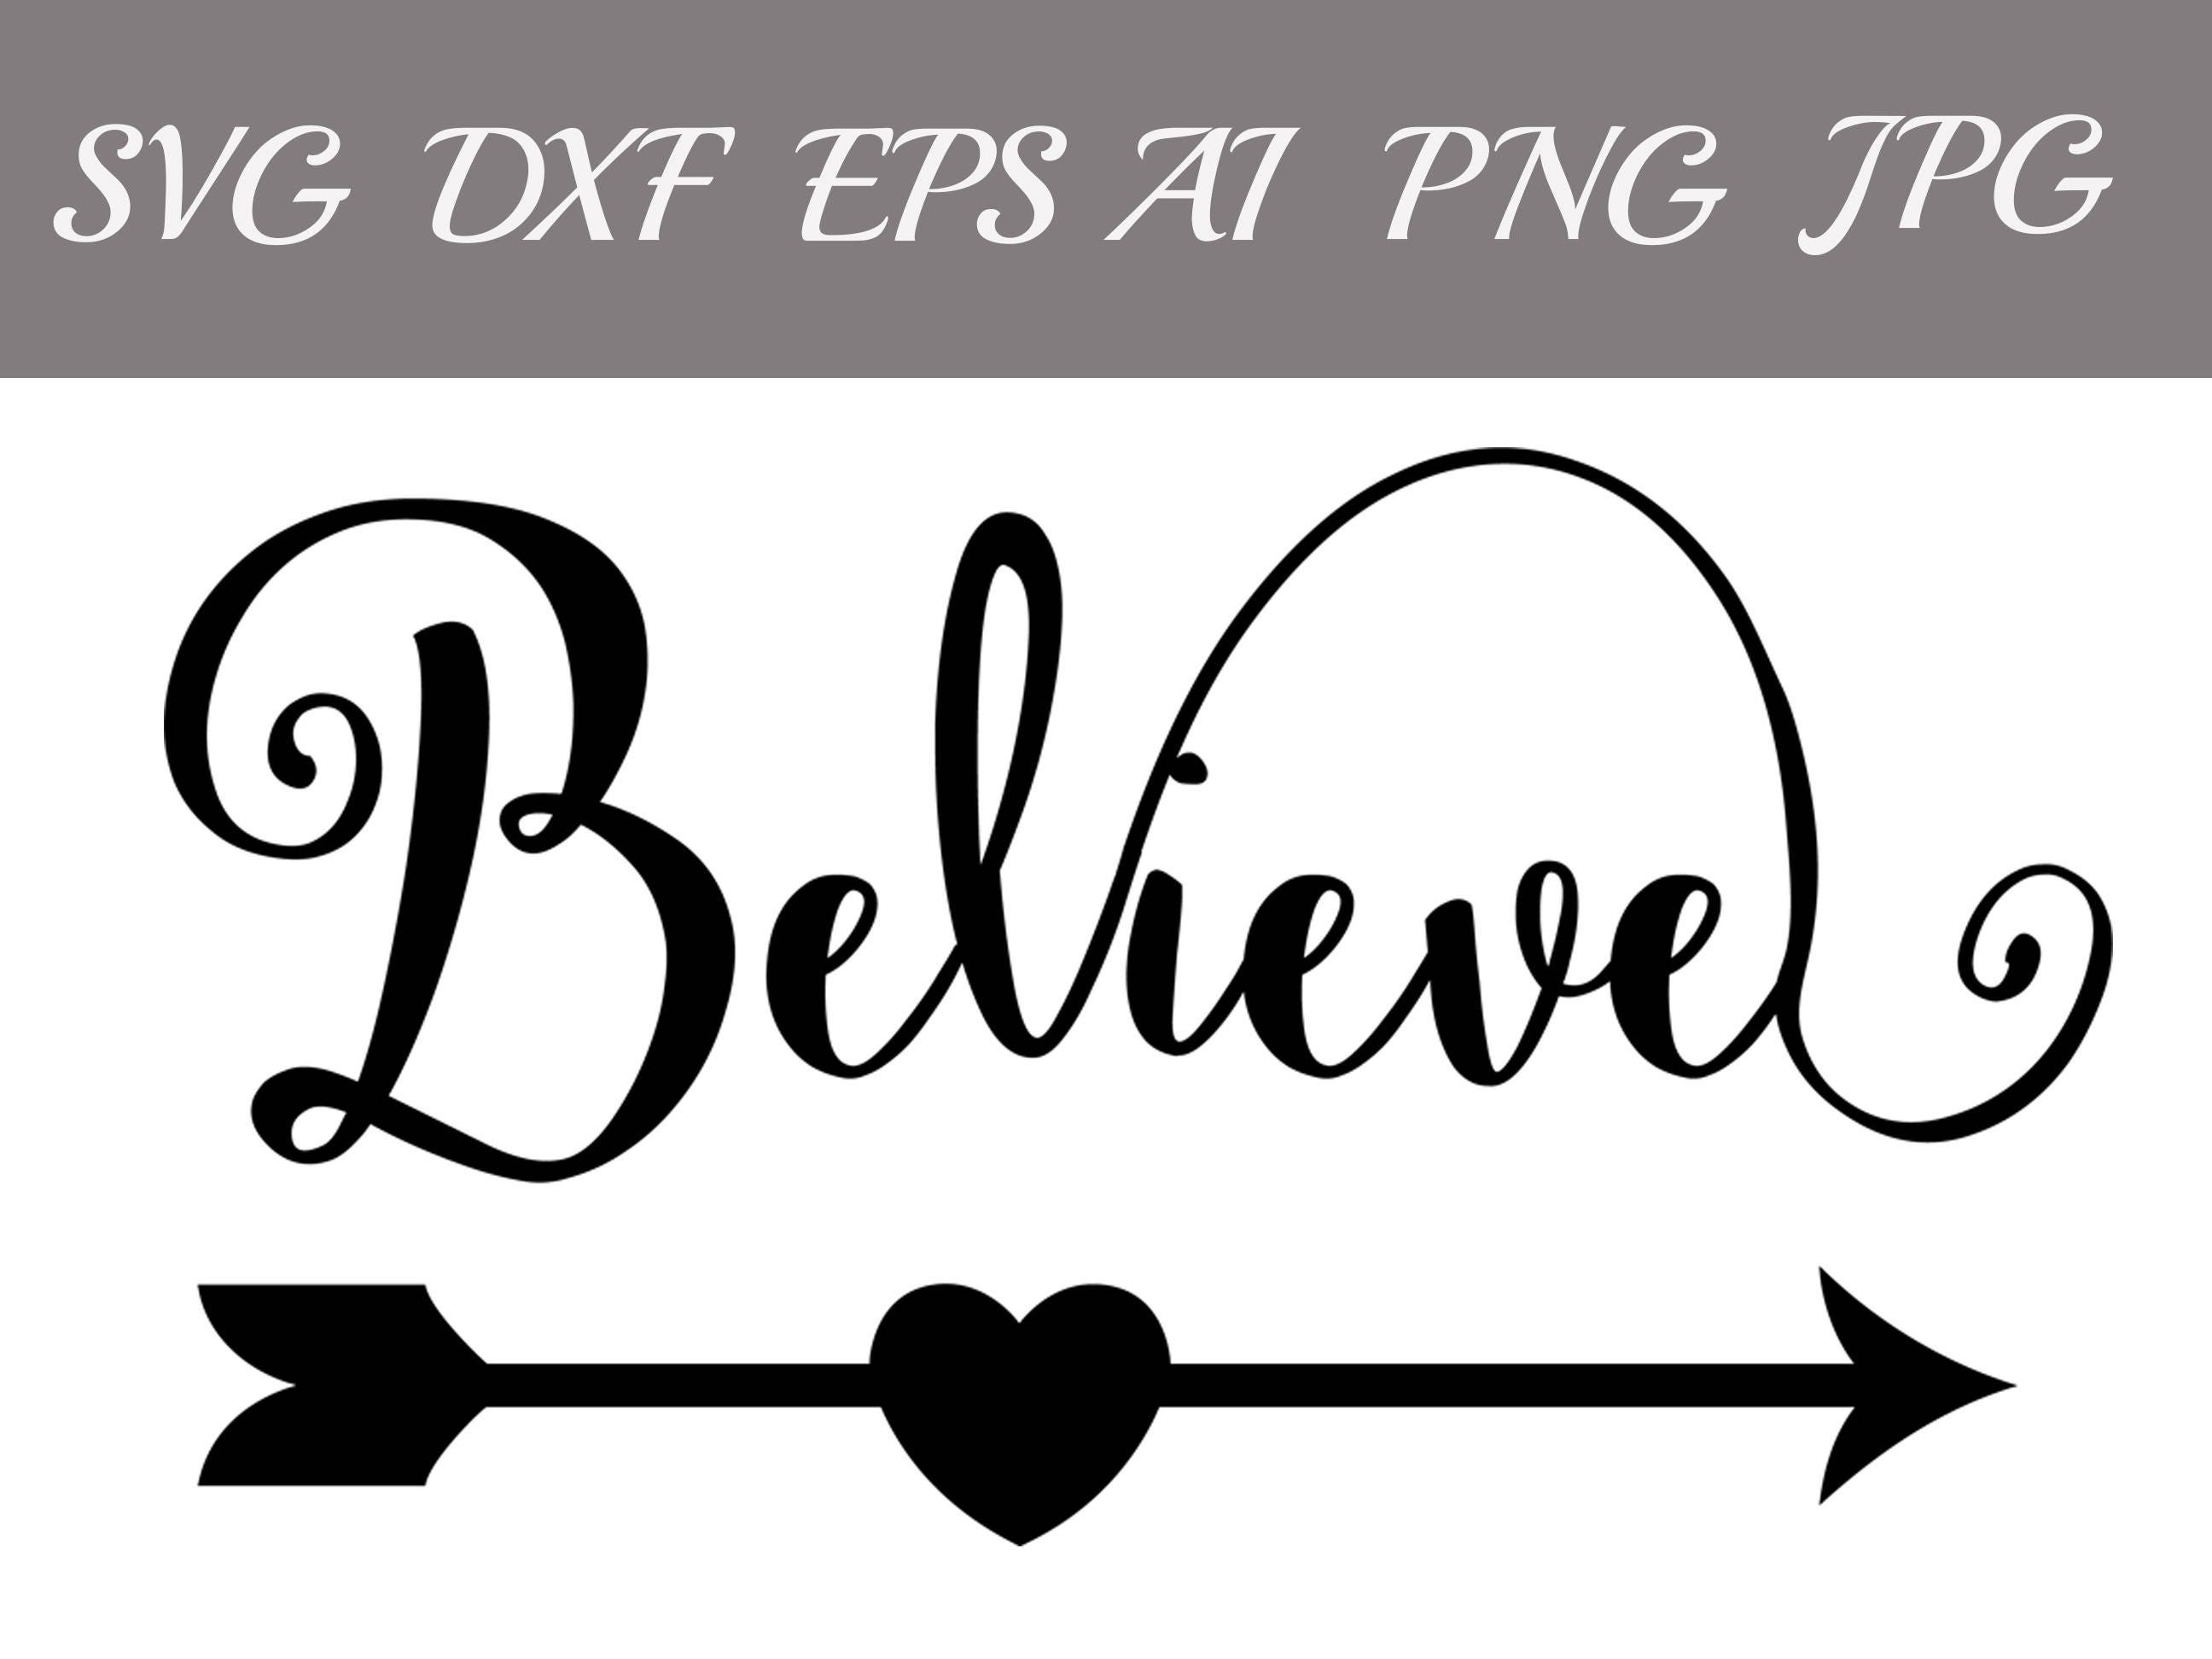 Believe Svg: SIGN SVG Christmas SvgDigital   Etsy